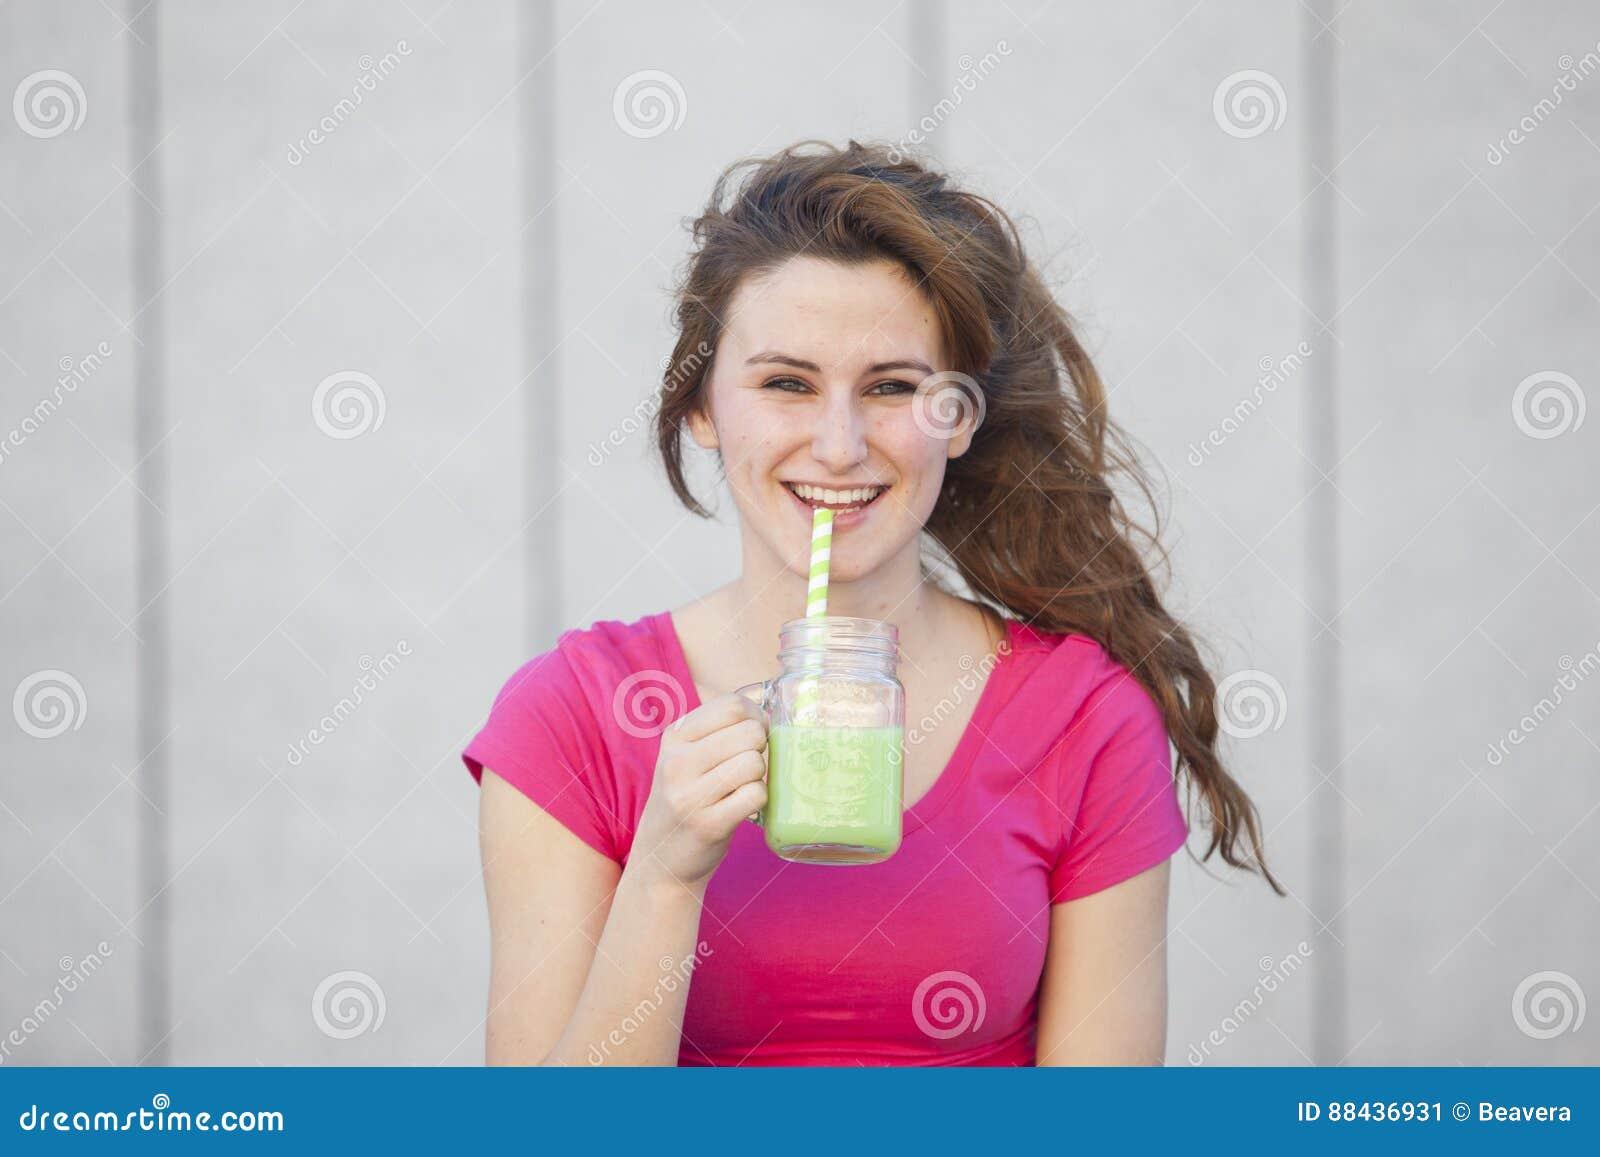 Healthy young teen girl assured